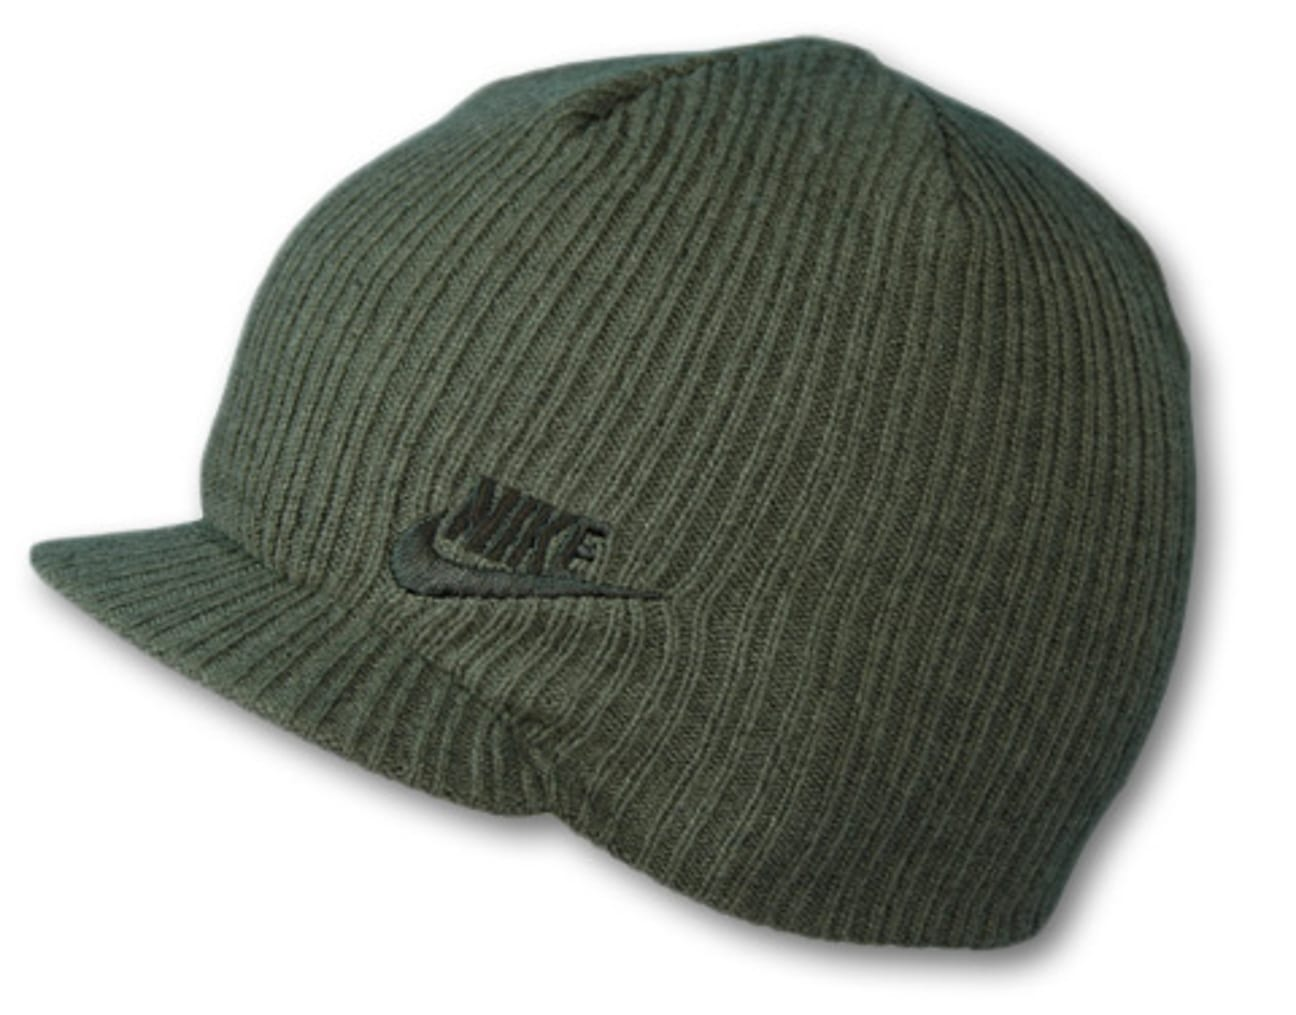 7d13ebd8dc5fb8 ... Rib Peak Pull On Hat by Nike - olive 1 ...